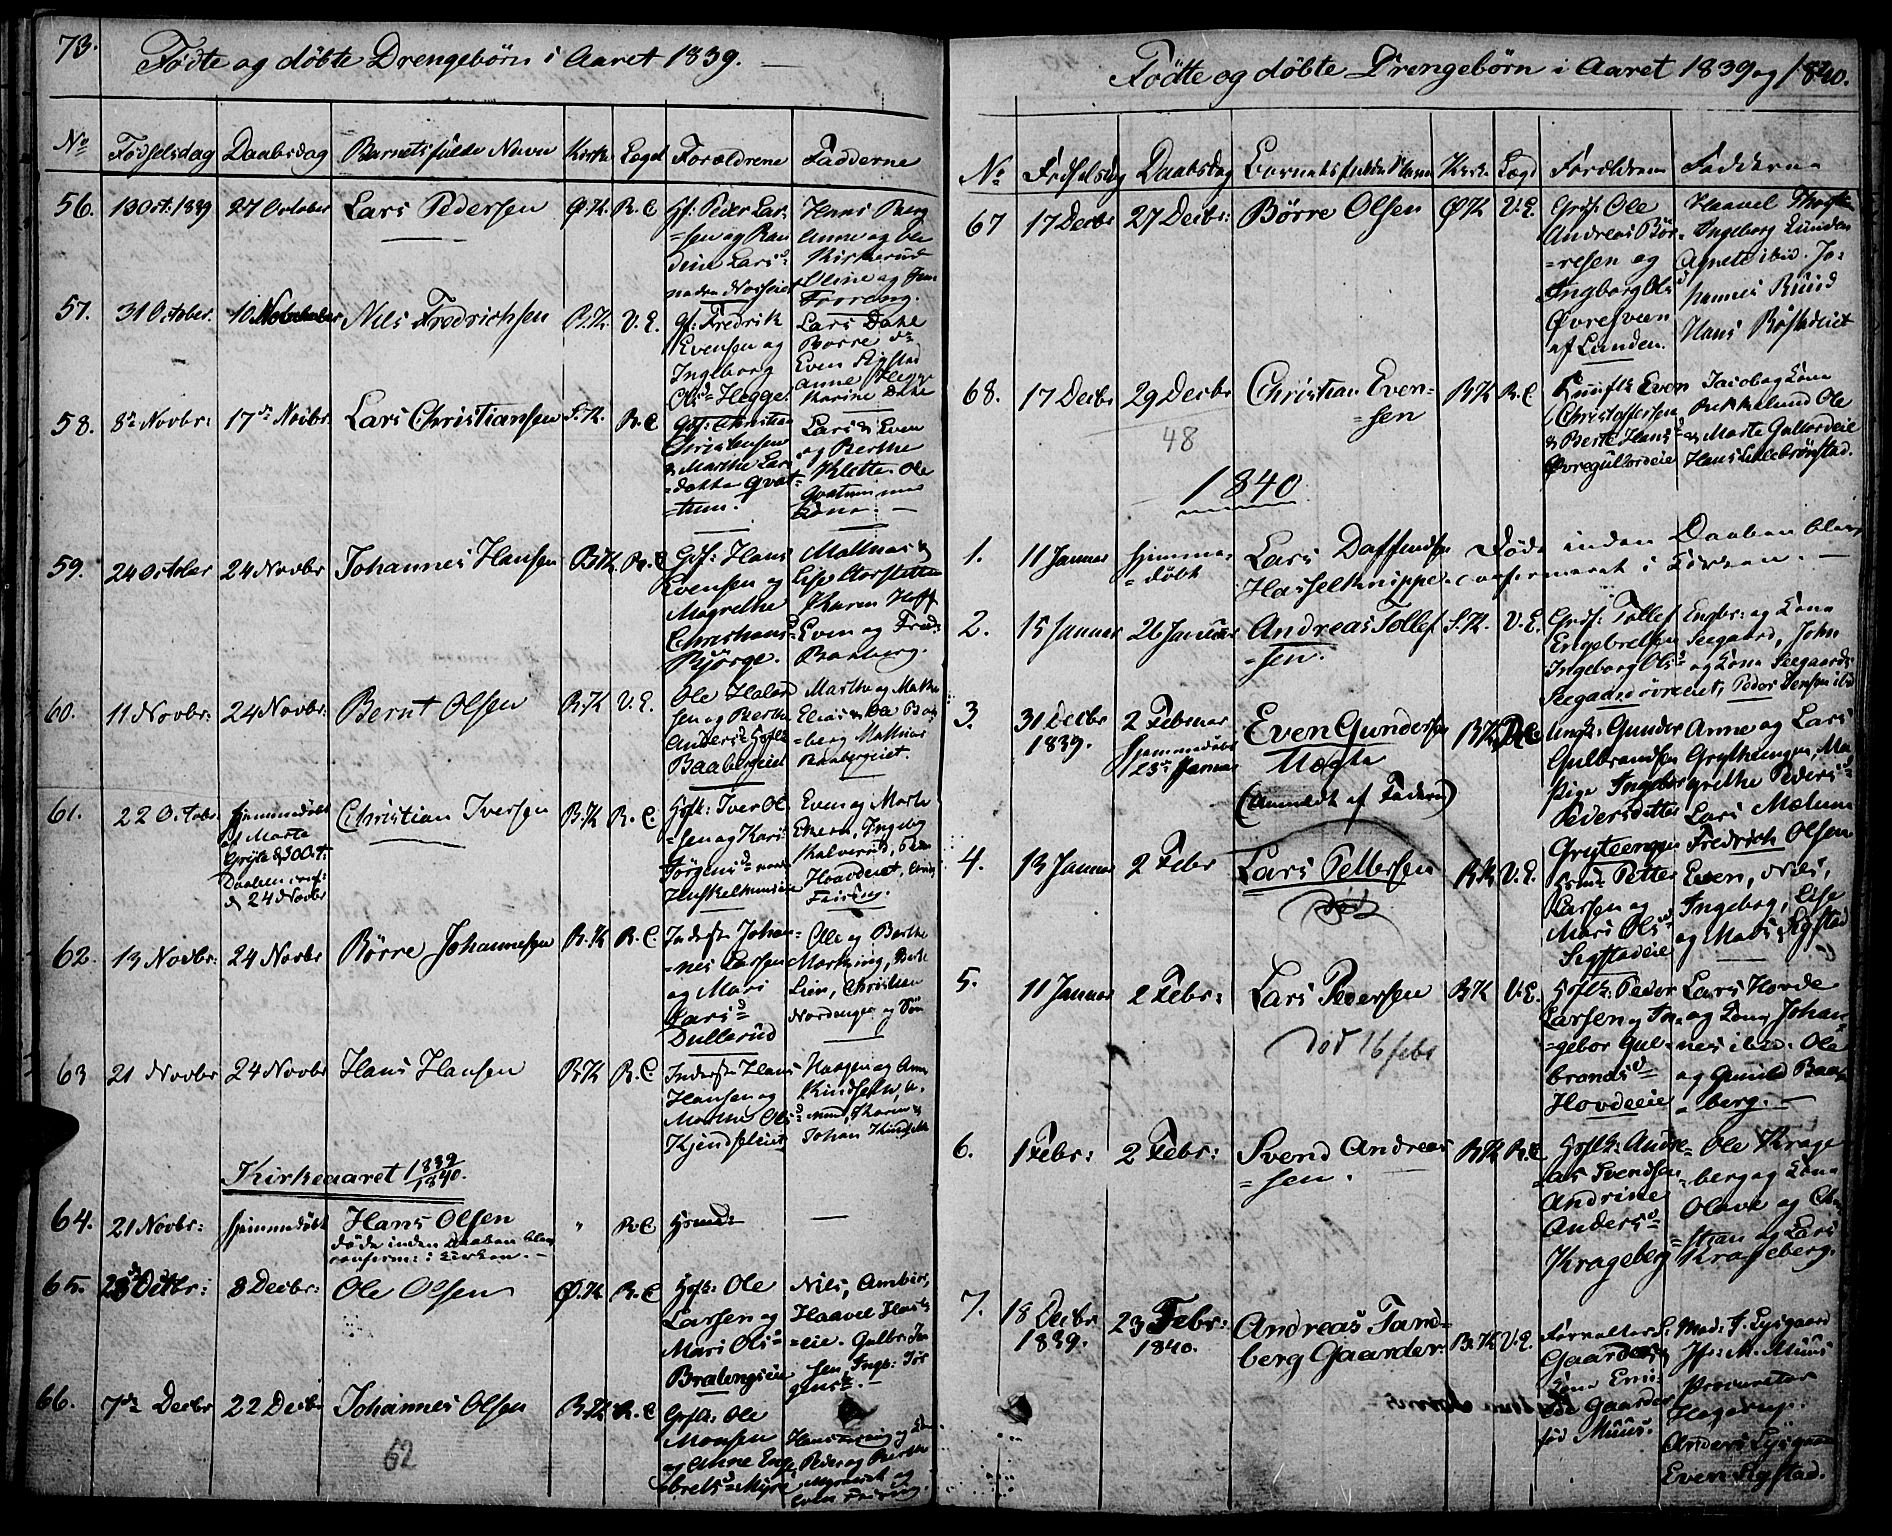 SAH, Biri prestekontor, Ministerialbok nr. 4, 1829-1842, s. 73